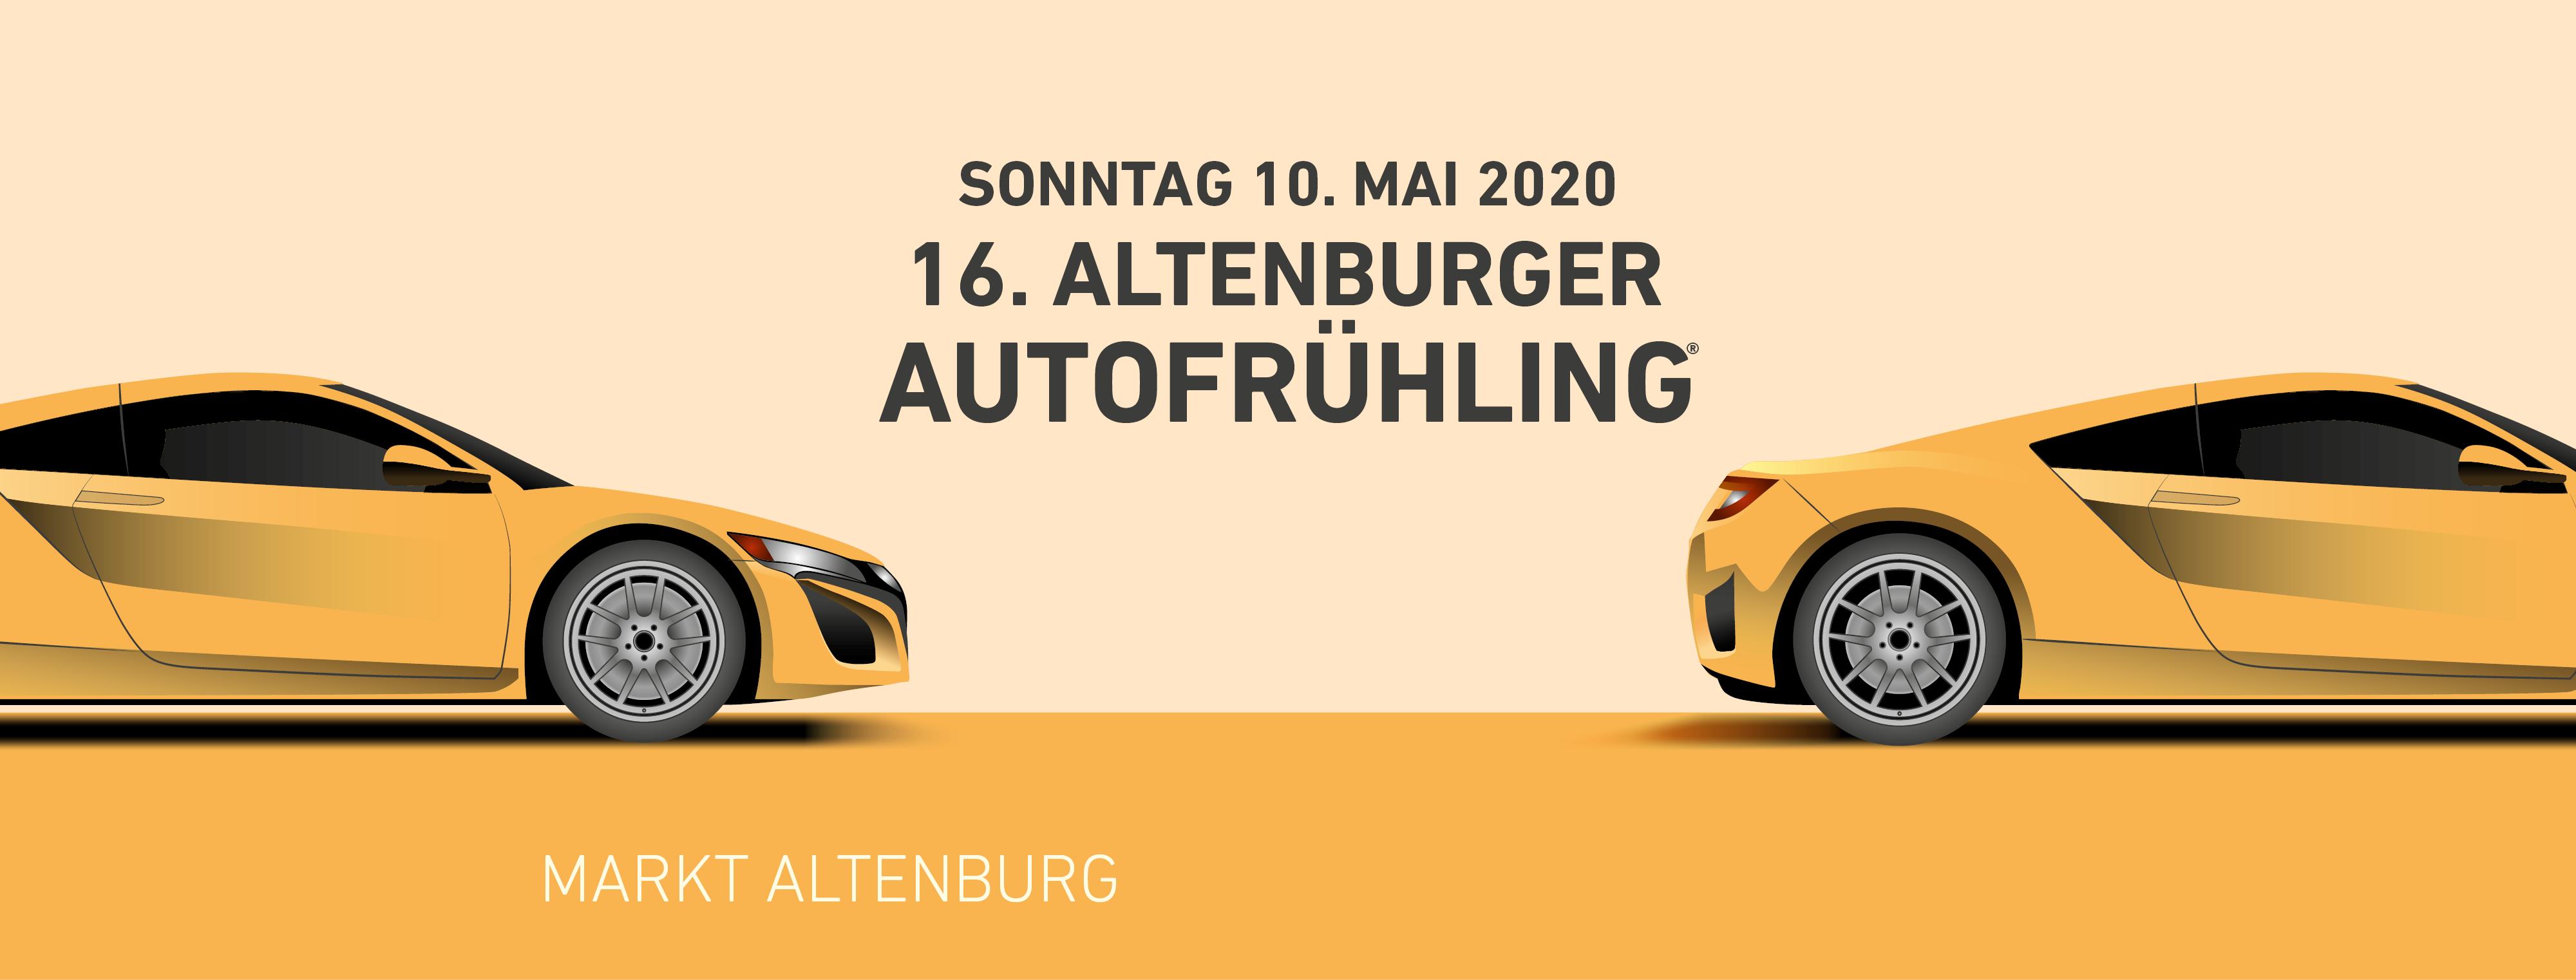 AF_Altenburg_2020_Hero_Header